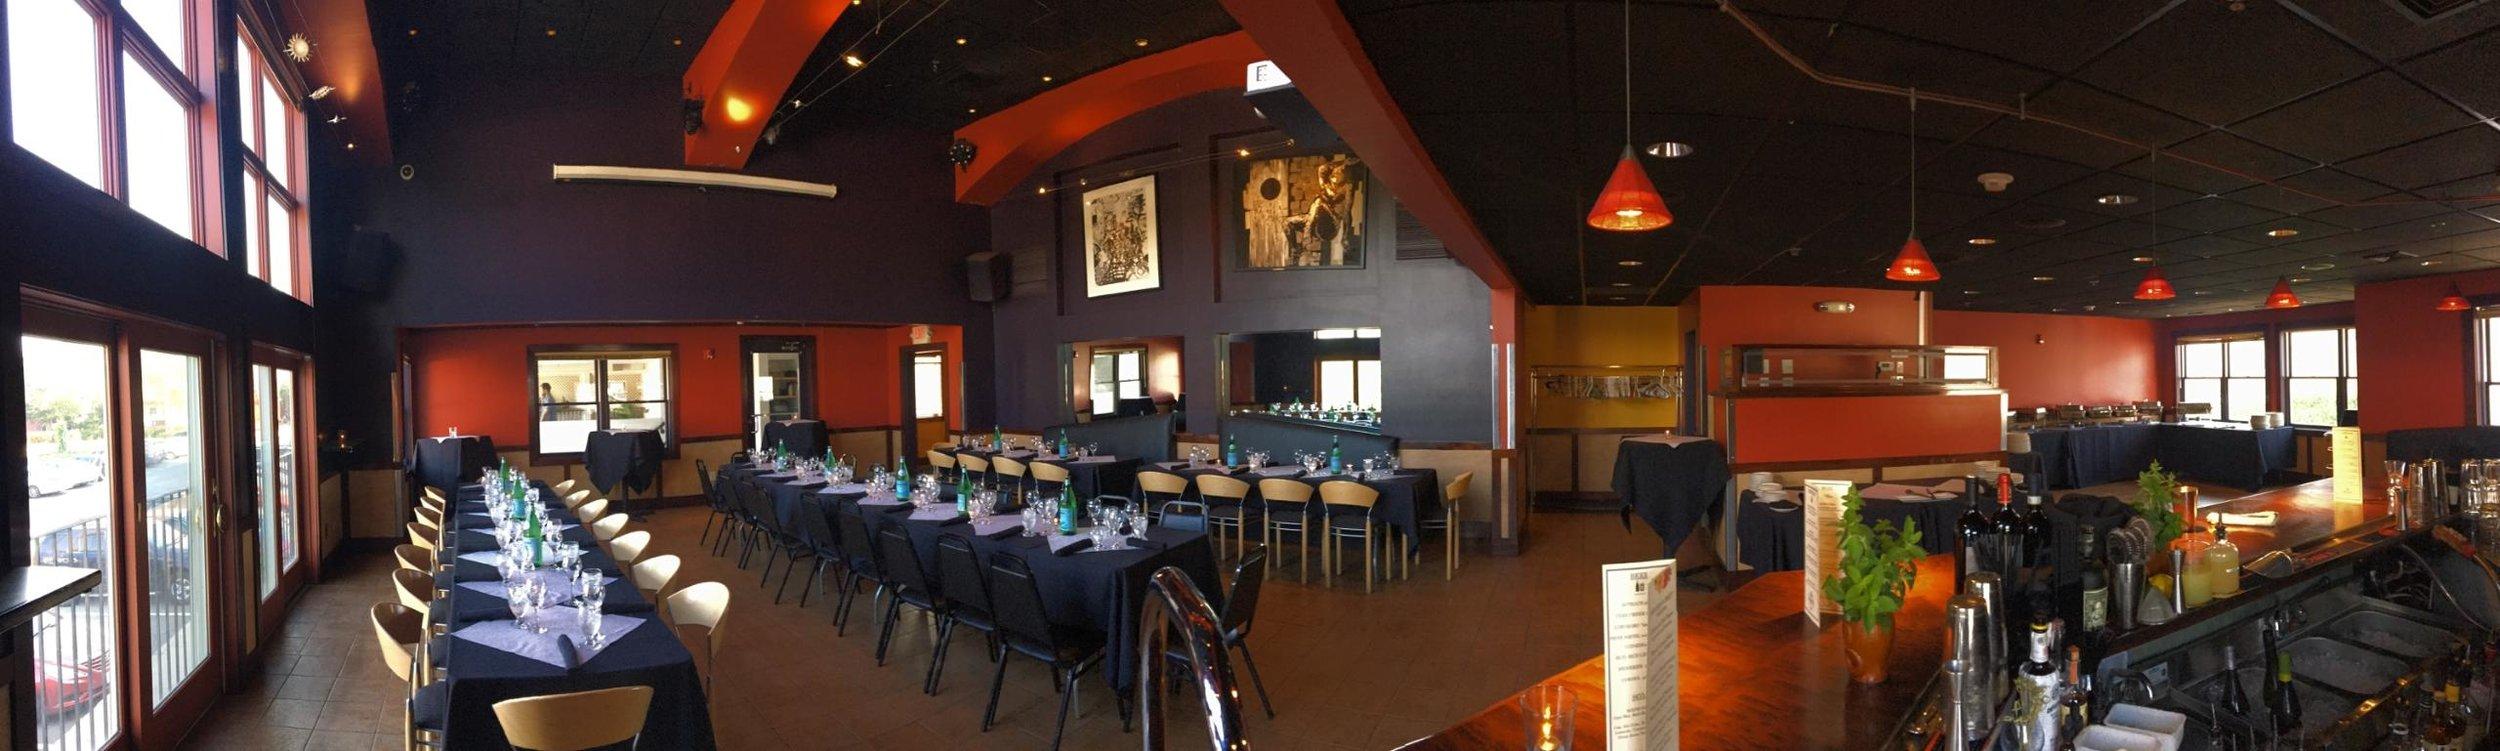 Bistro 63 Banquet Room Panoramic.jpg